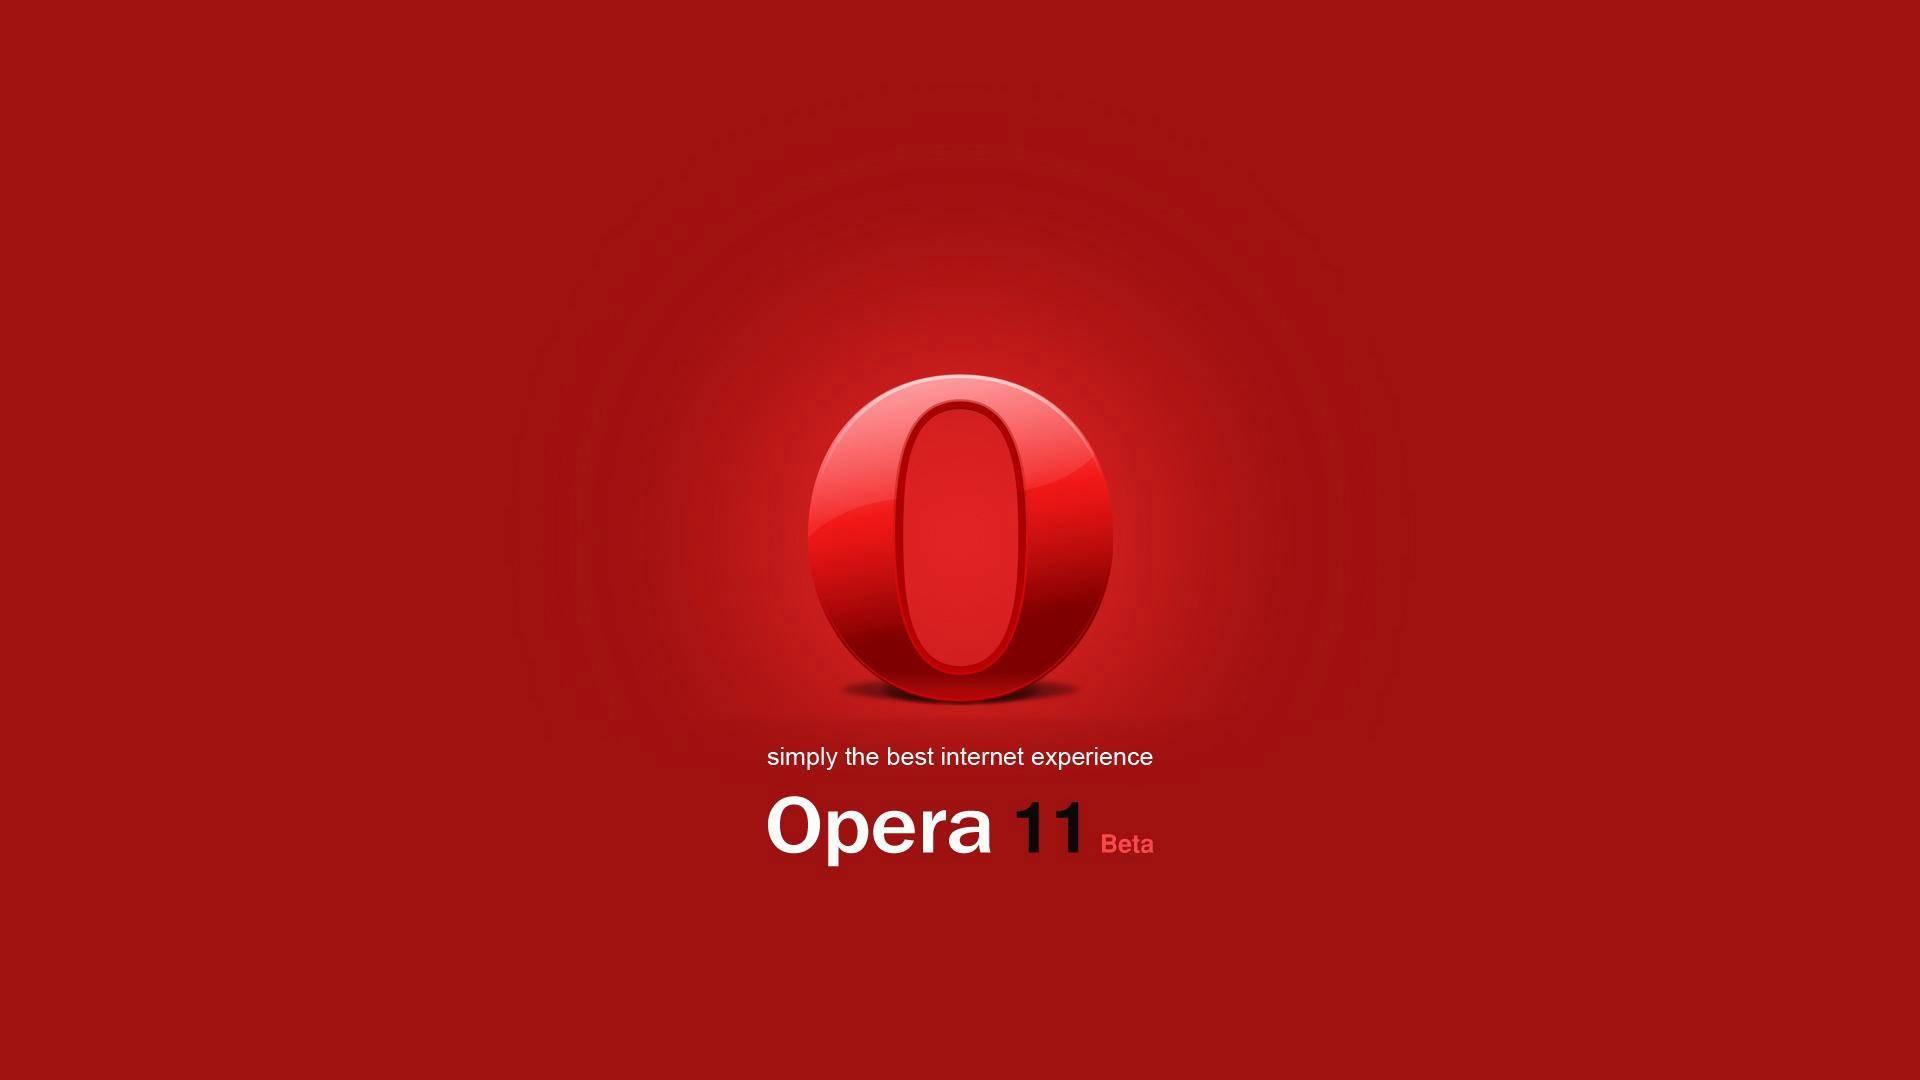 opera 11 wallpaper background